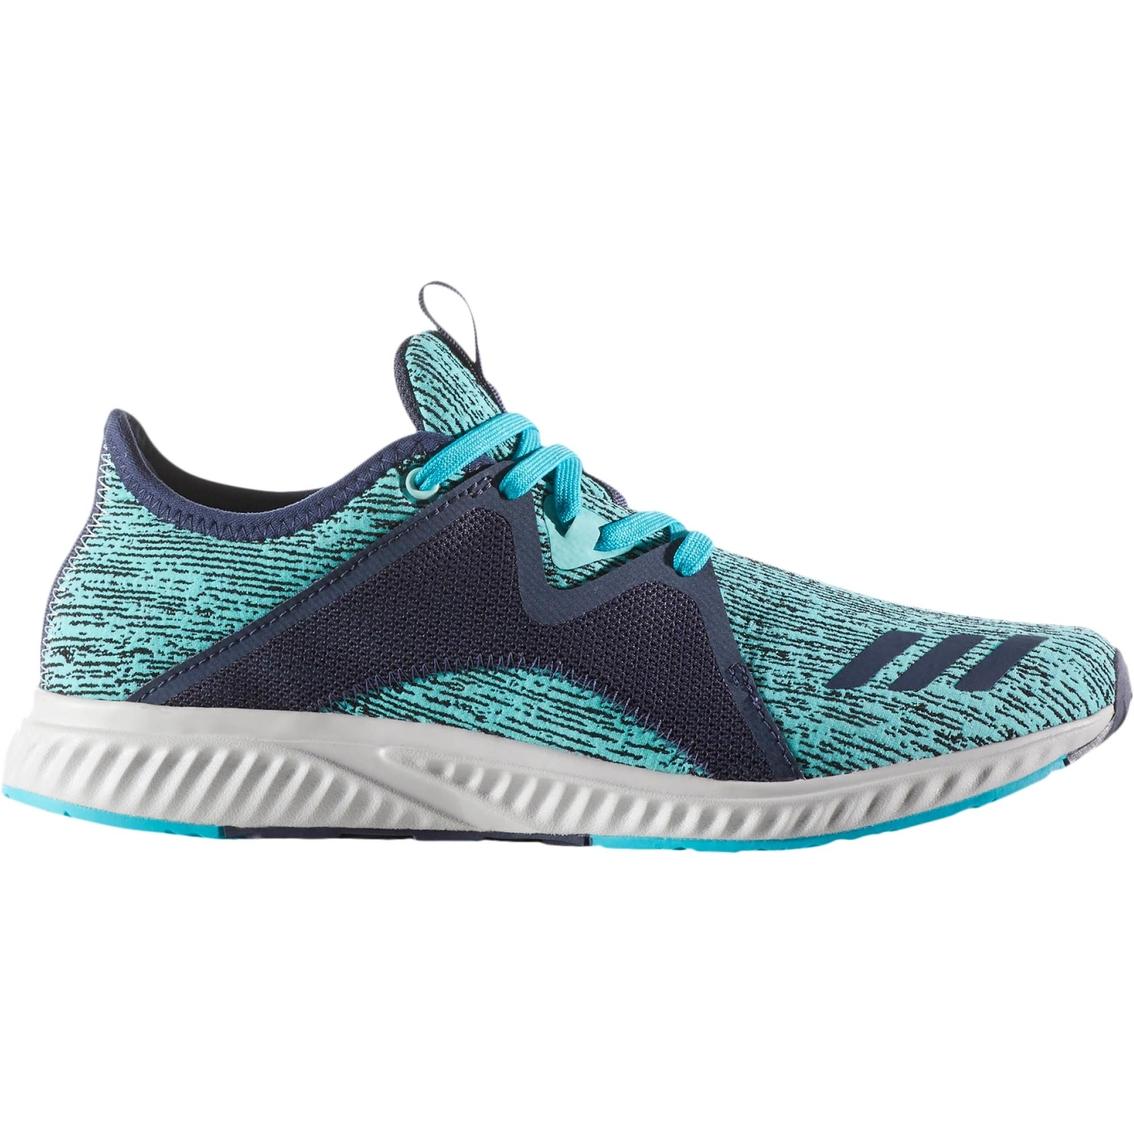 Adidas ShoesBack To School Women's Edge Lux Running dxBoQeWrC